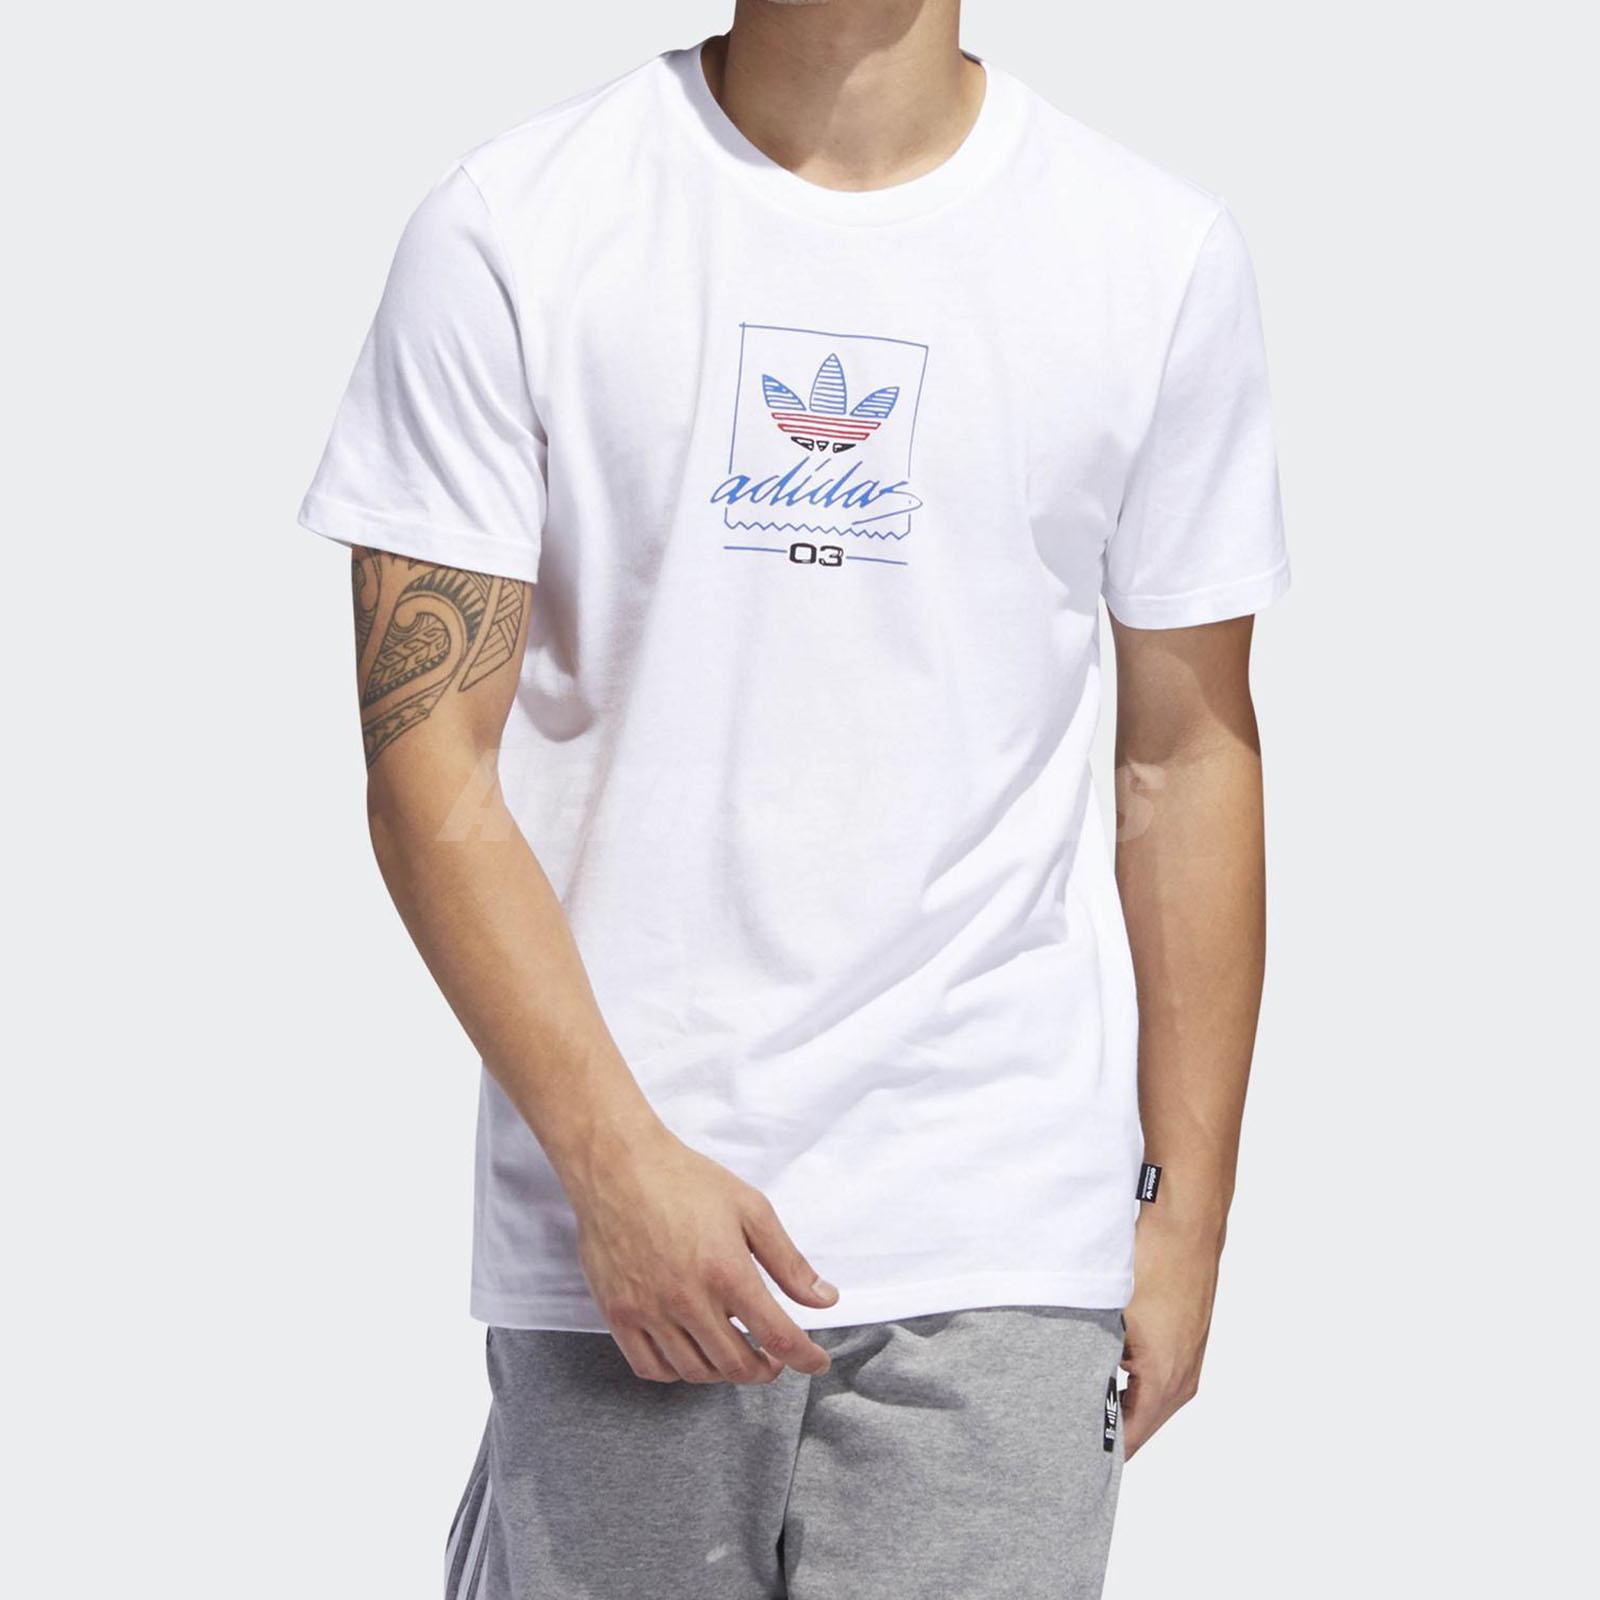 Inactivo Incienso Despertar  adidas Originals Grand Tee Broadway Bullet Skateboarding New York White  DU8341 | eBay